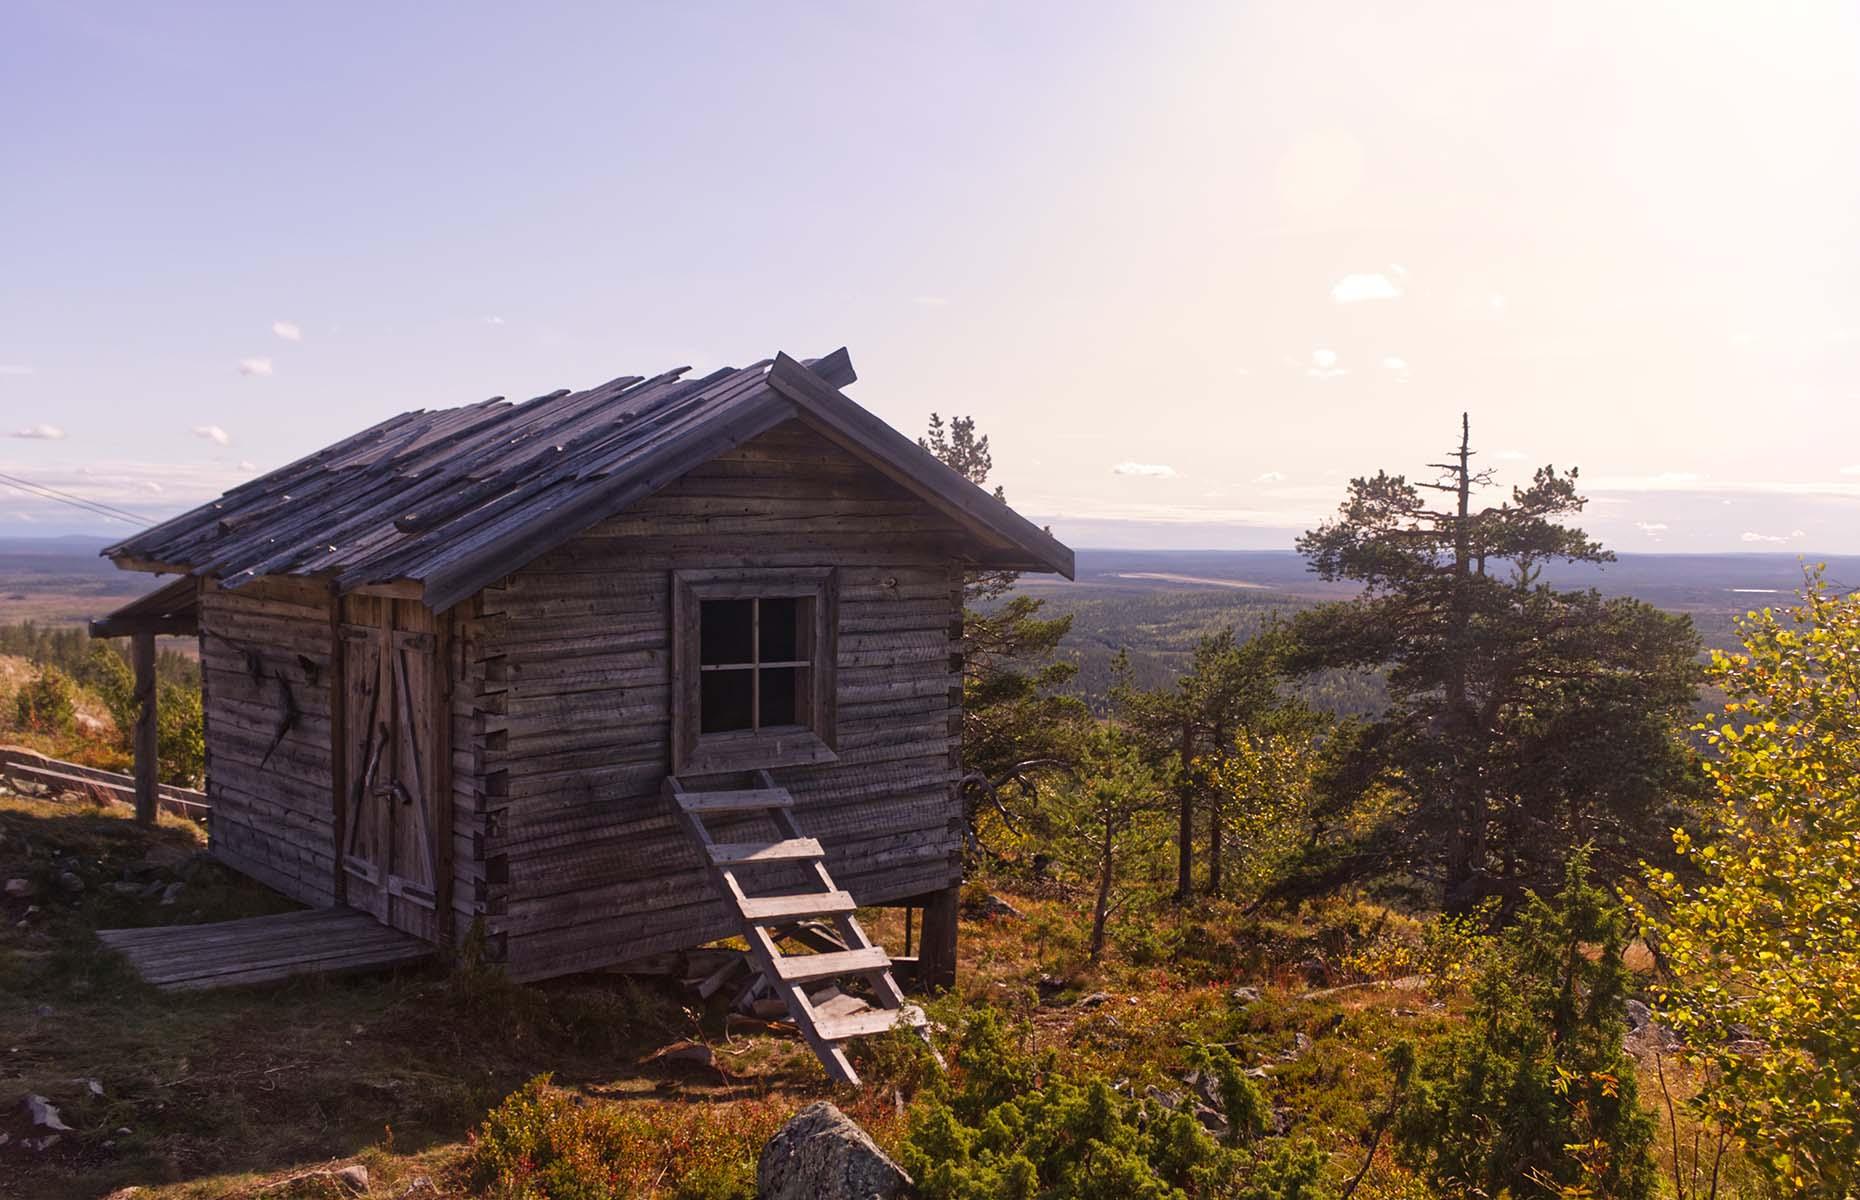 Spend the night in a wilderness hut (Image: Eero P. Kangas/Shutterstock)